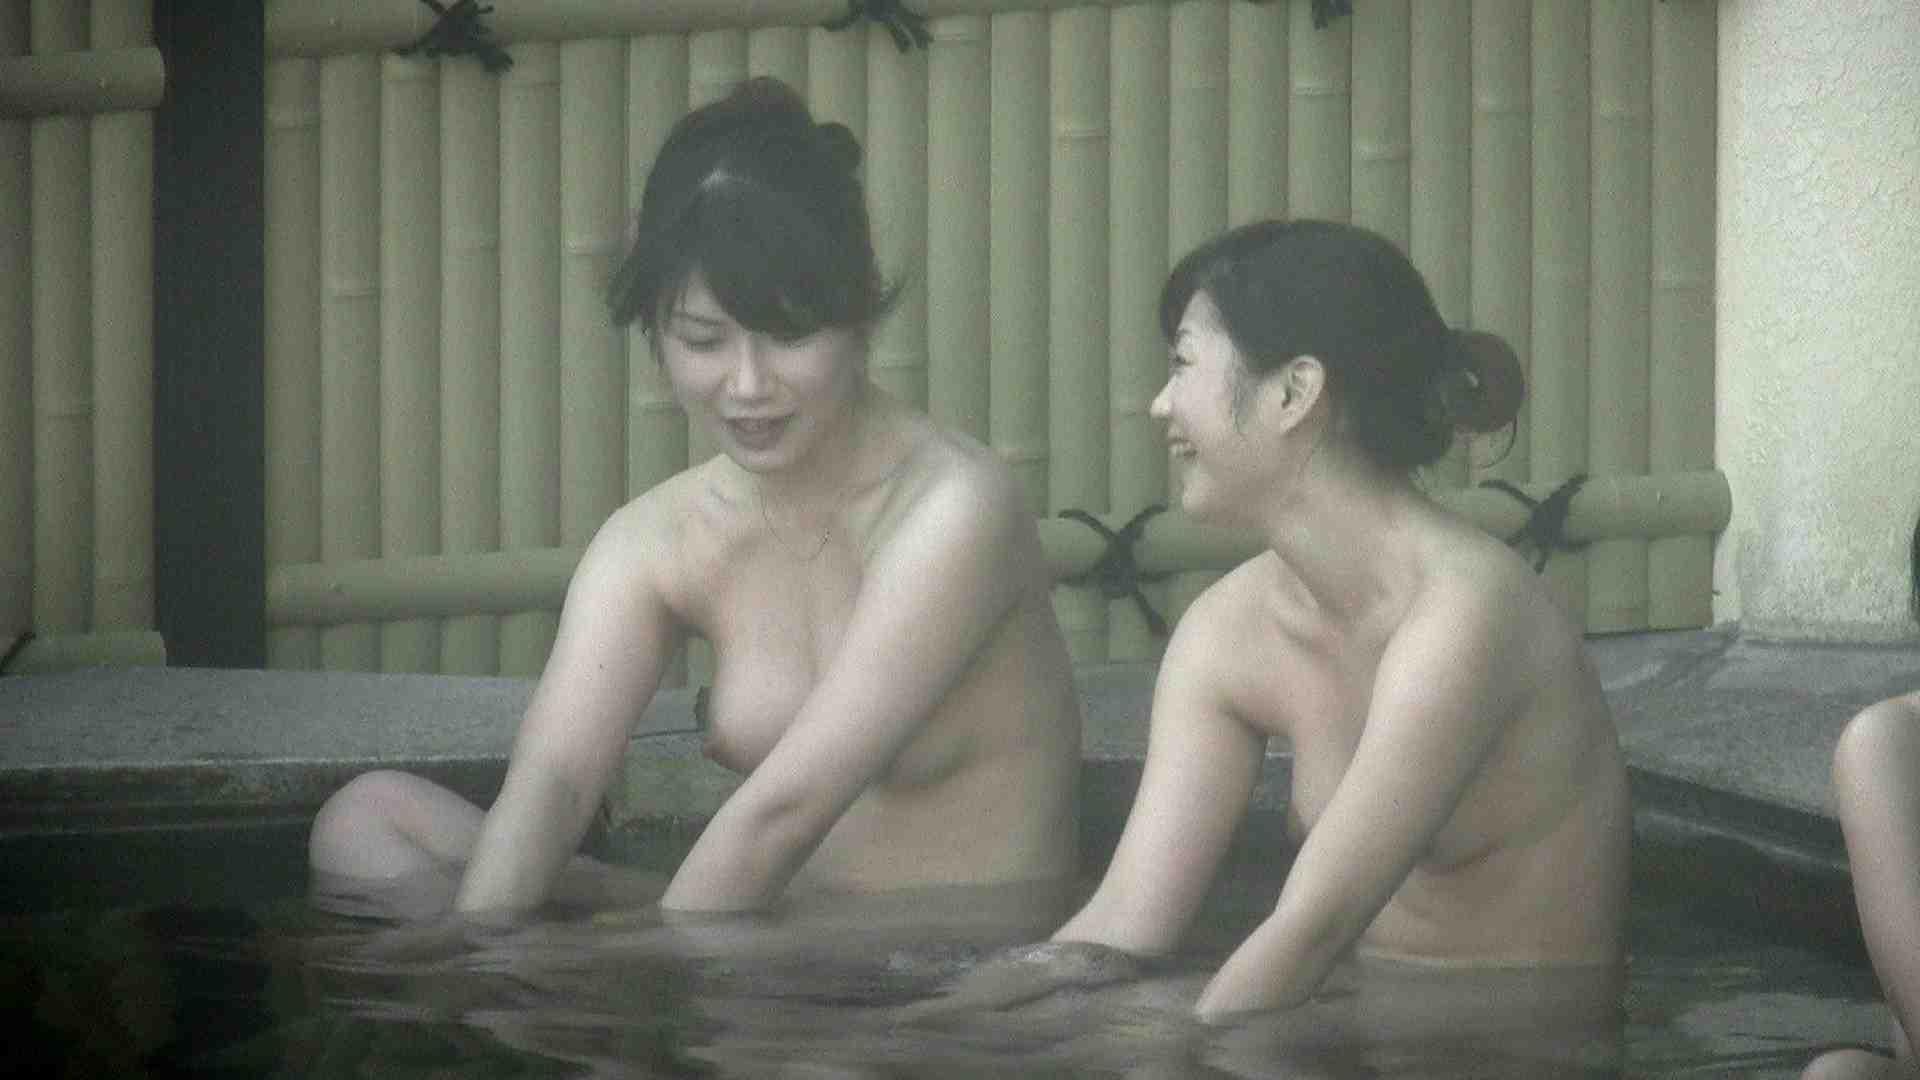 Aquaな露天風呂Vol.206 露天 | HなOL  74pic 5